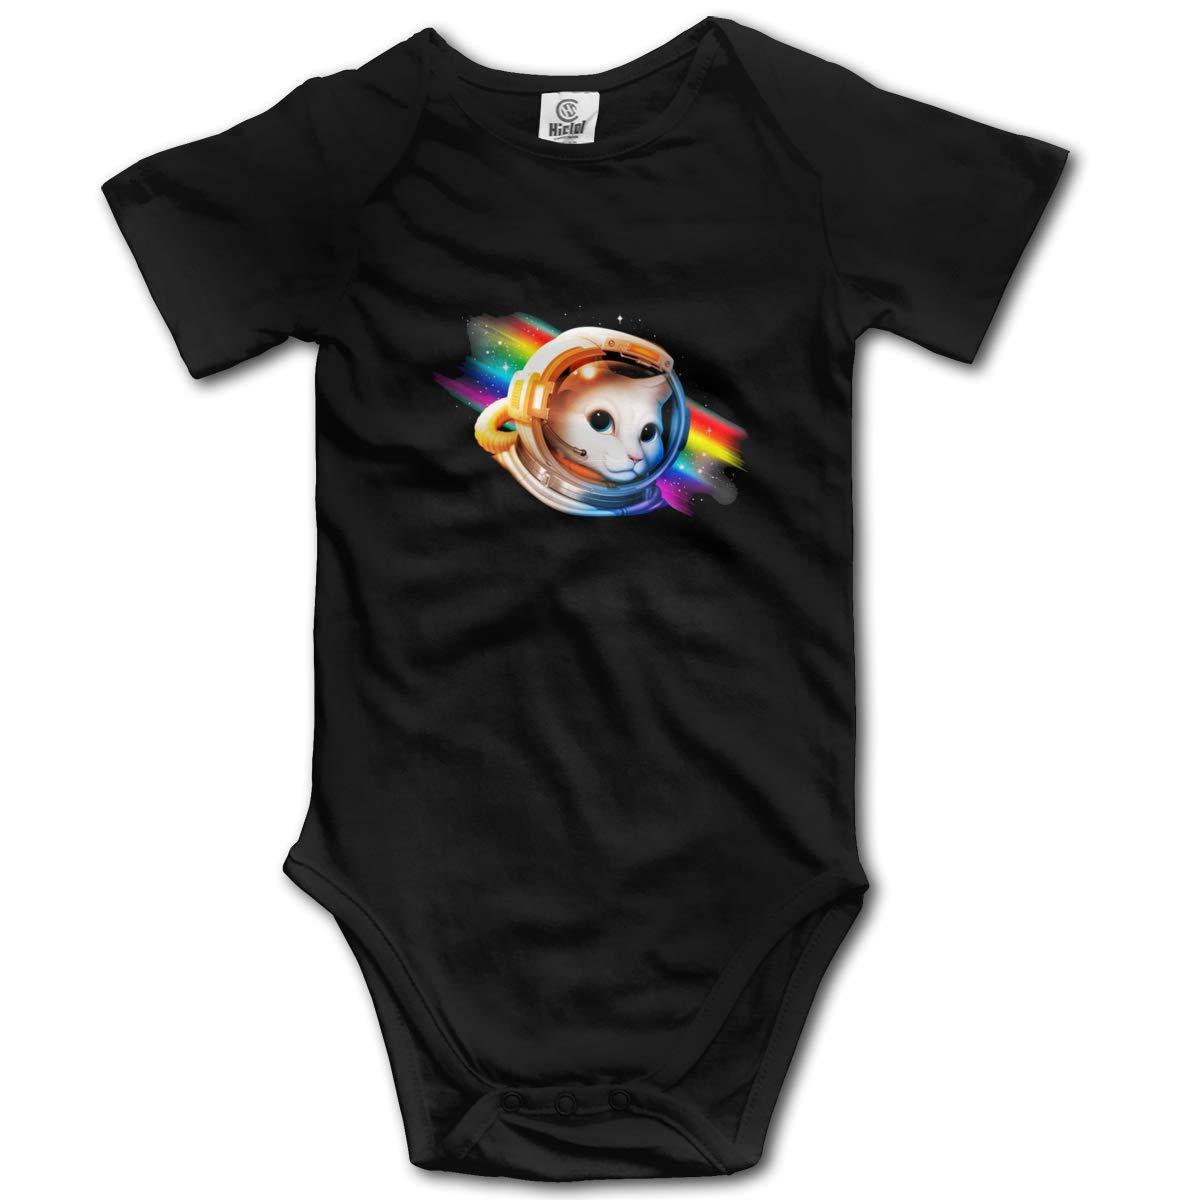 Astronaut Cat Baby Romper 0-18 Months Newborn Baby Girls Boys Layette Rompers Black